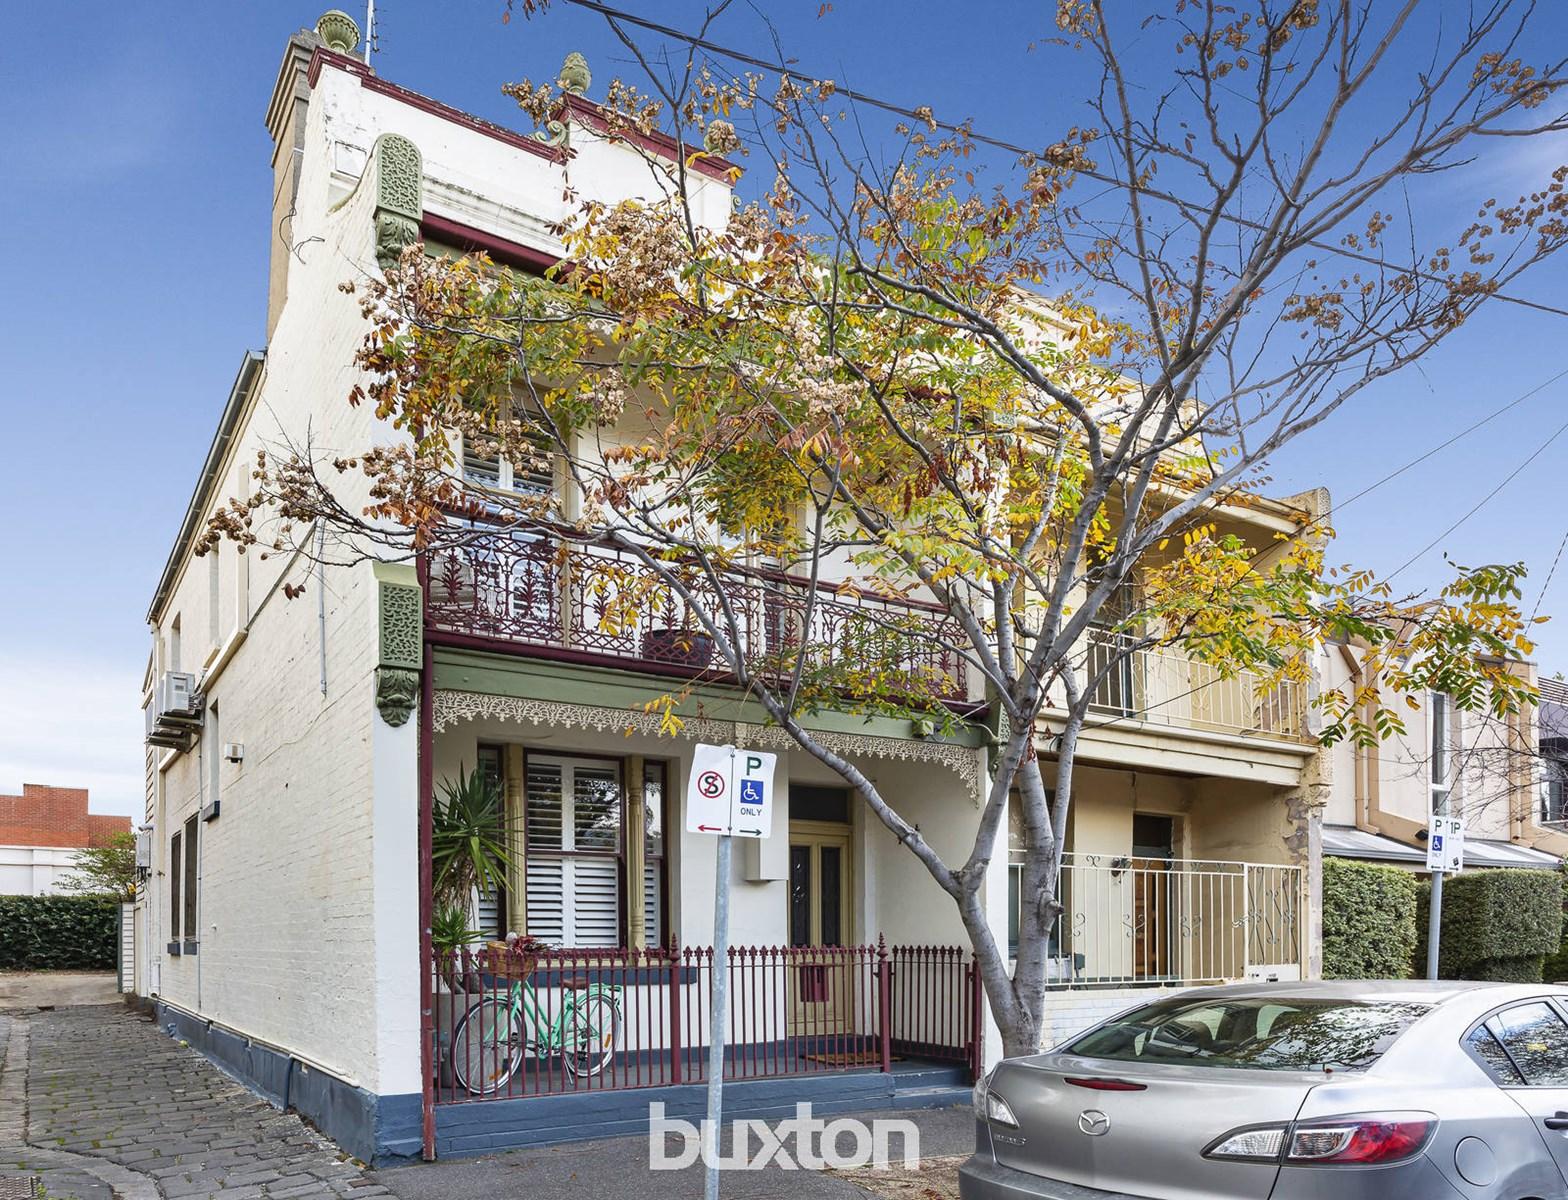 1 Church Street, South Melbourne VIC 3205